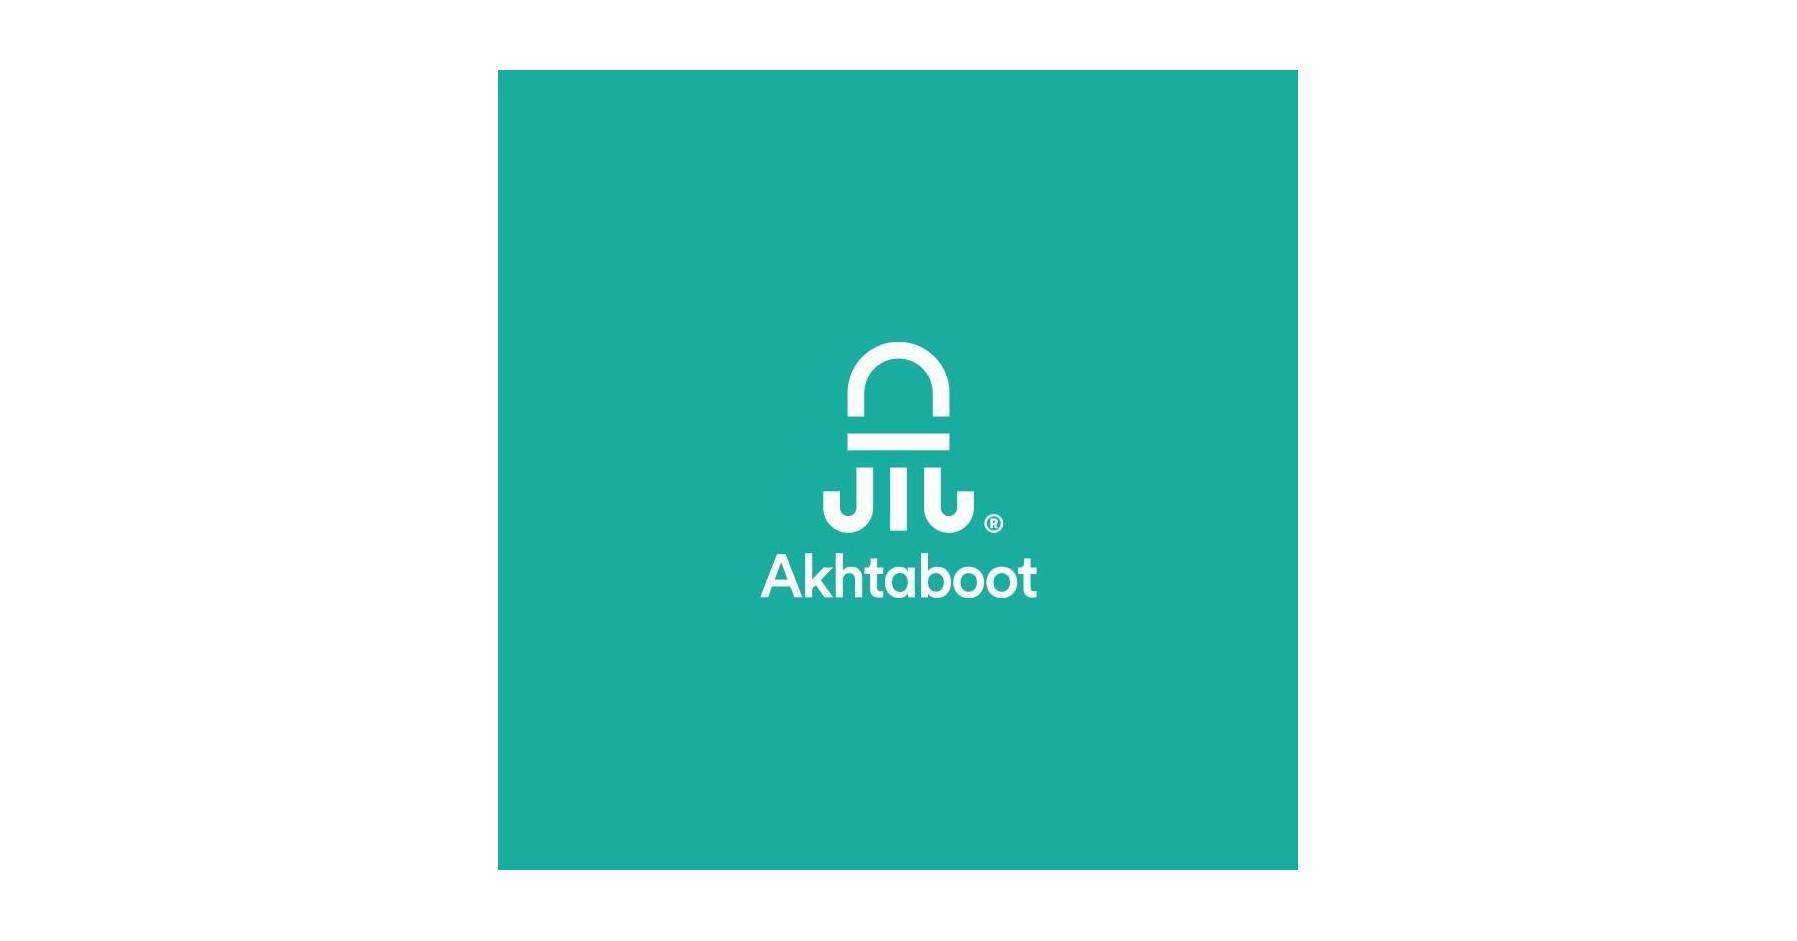 صورة Job: Digital Community Manager at Akhtaboot Group in Cairo, Egypt